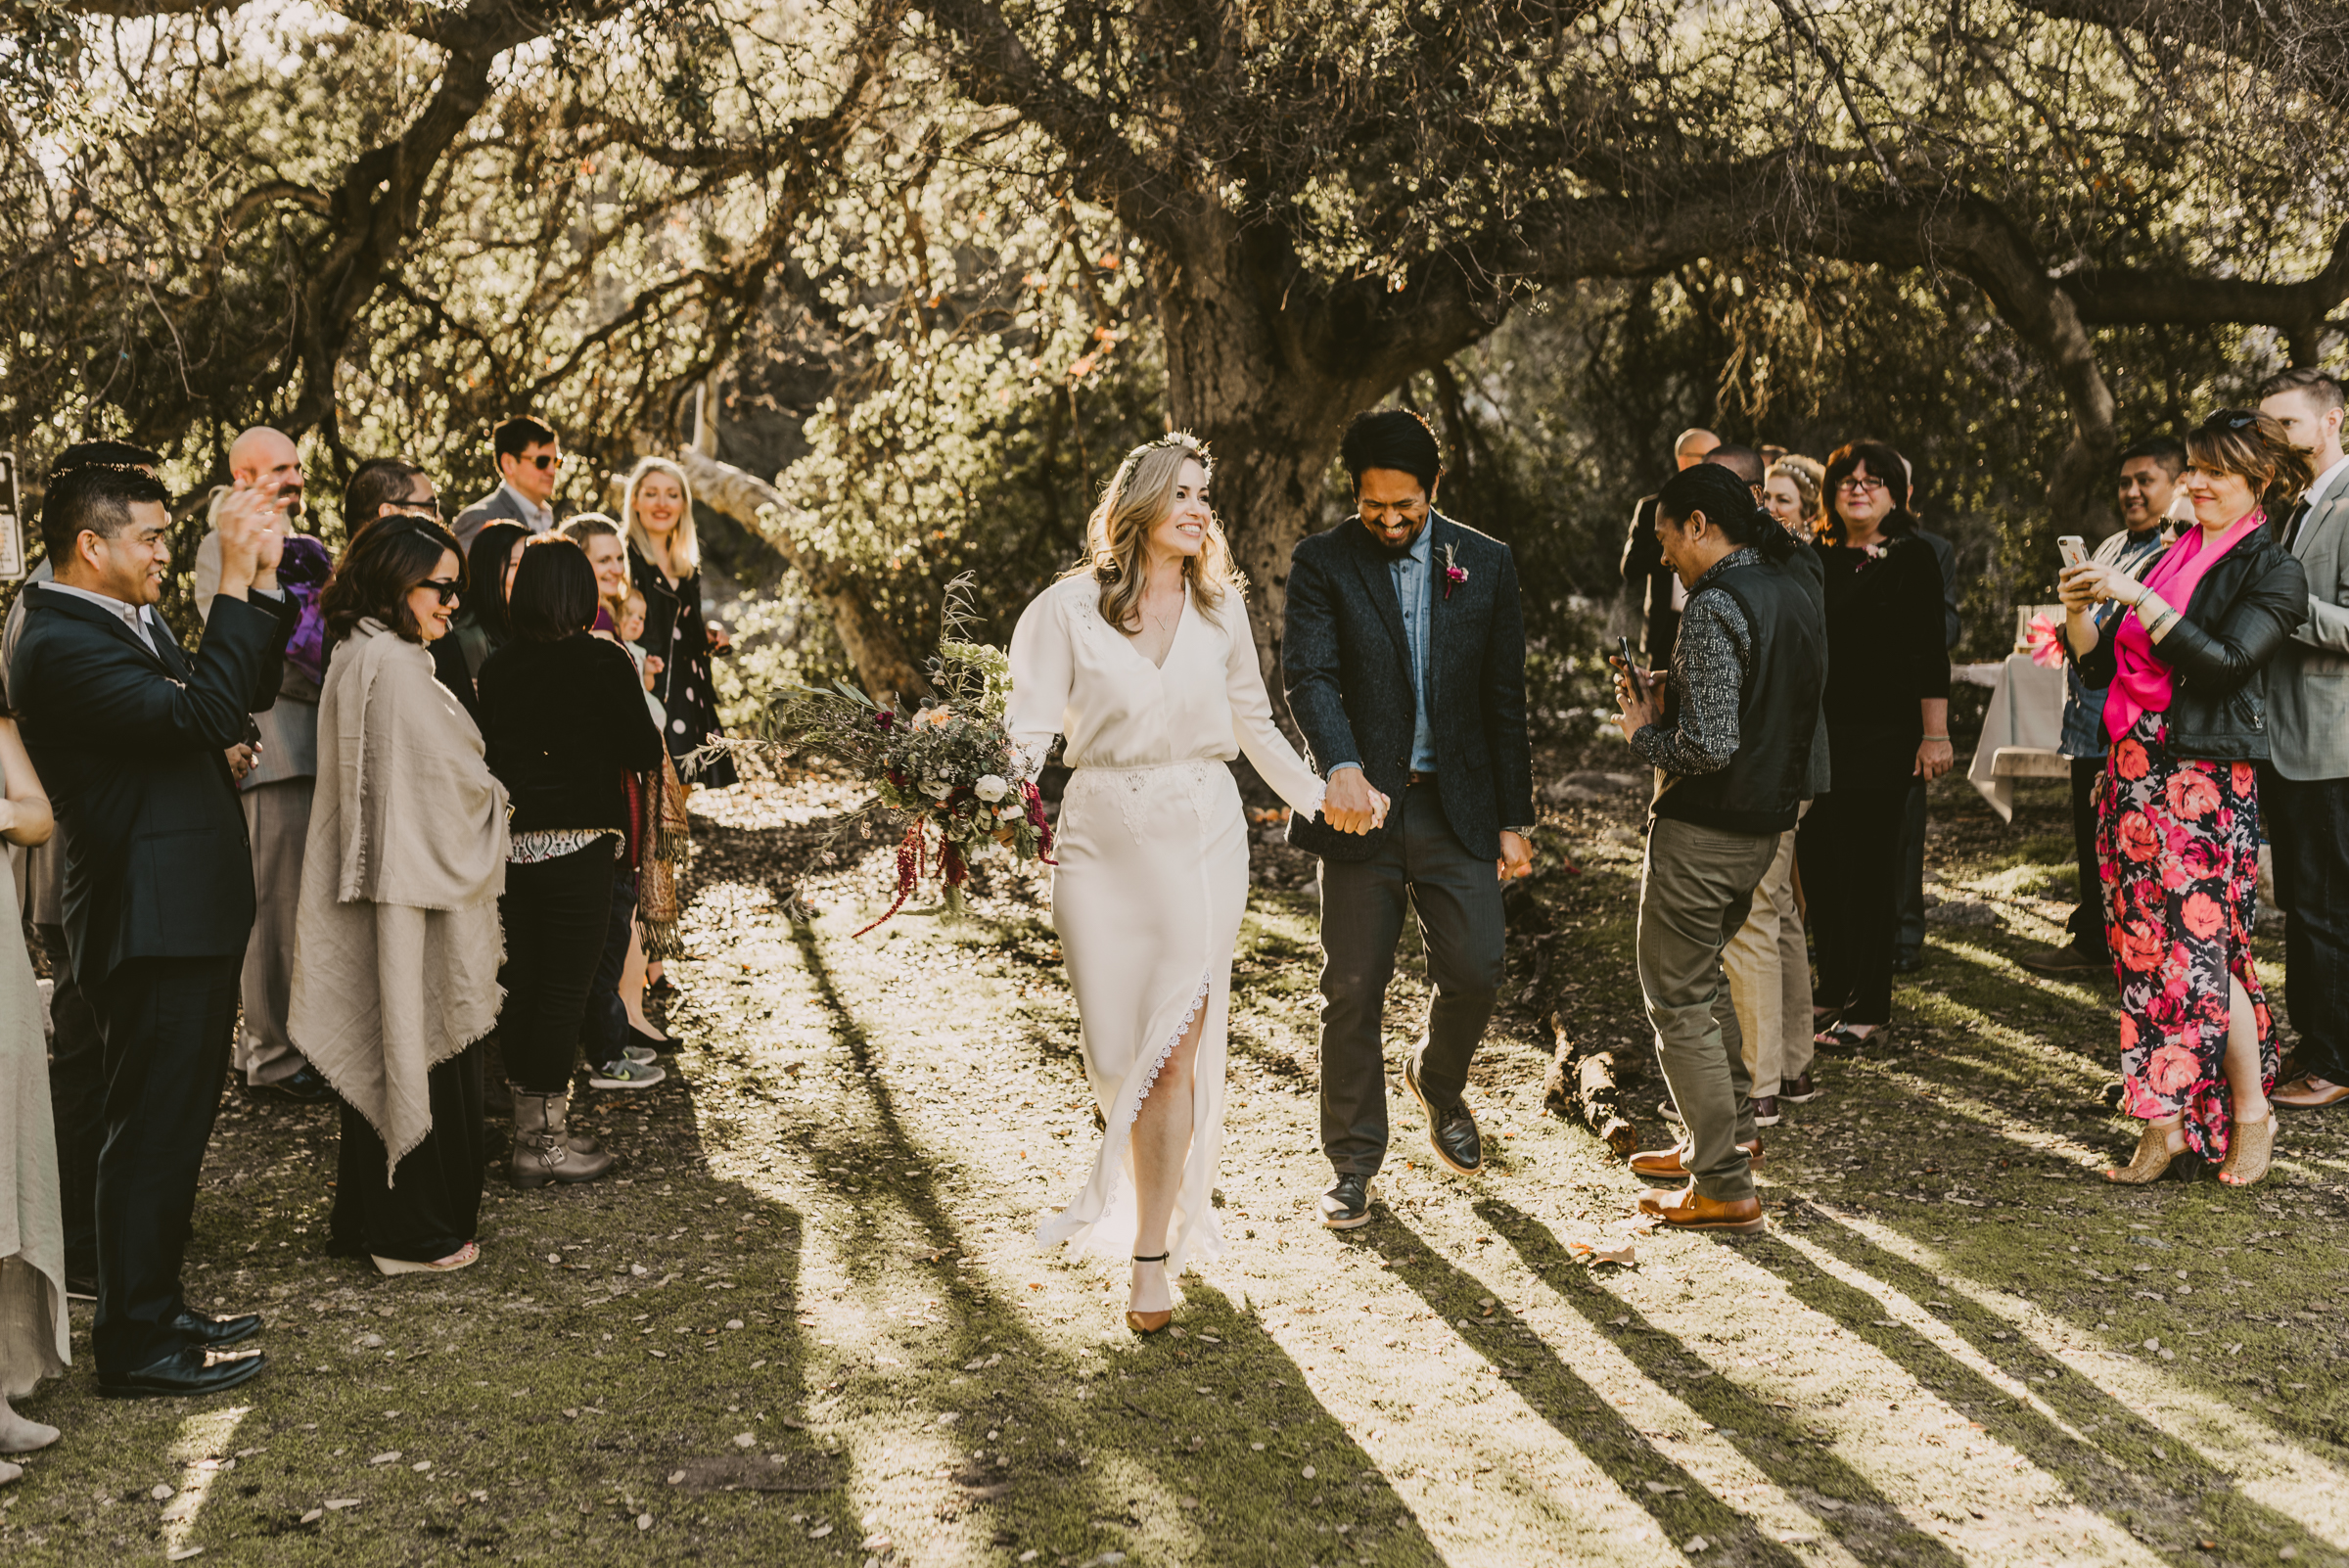 ©Isaiah + Taylor Photography - Intimate Elopement, Eaton Canyon, Los Angeles Wedding Photographer-40.jpg